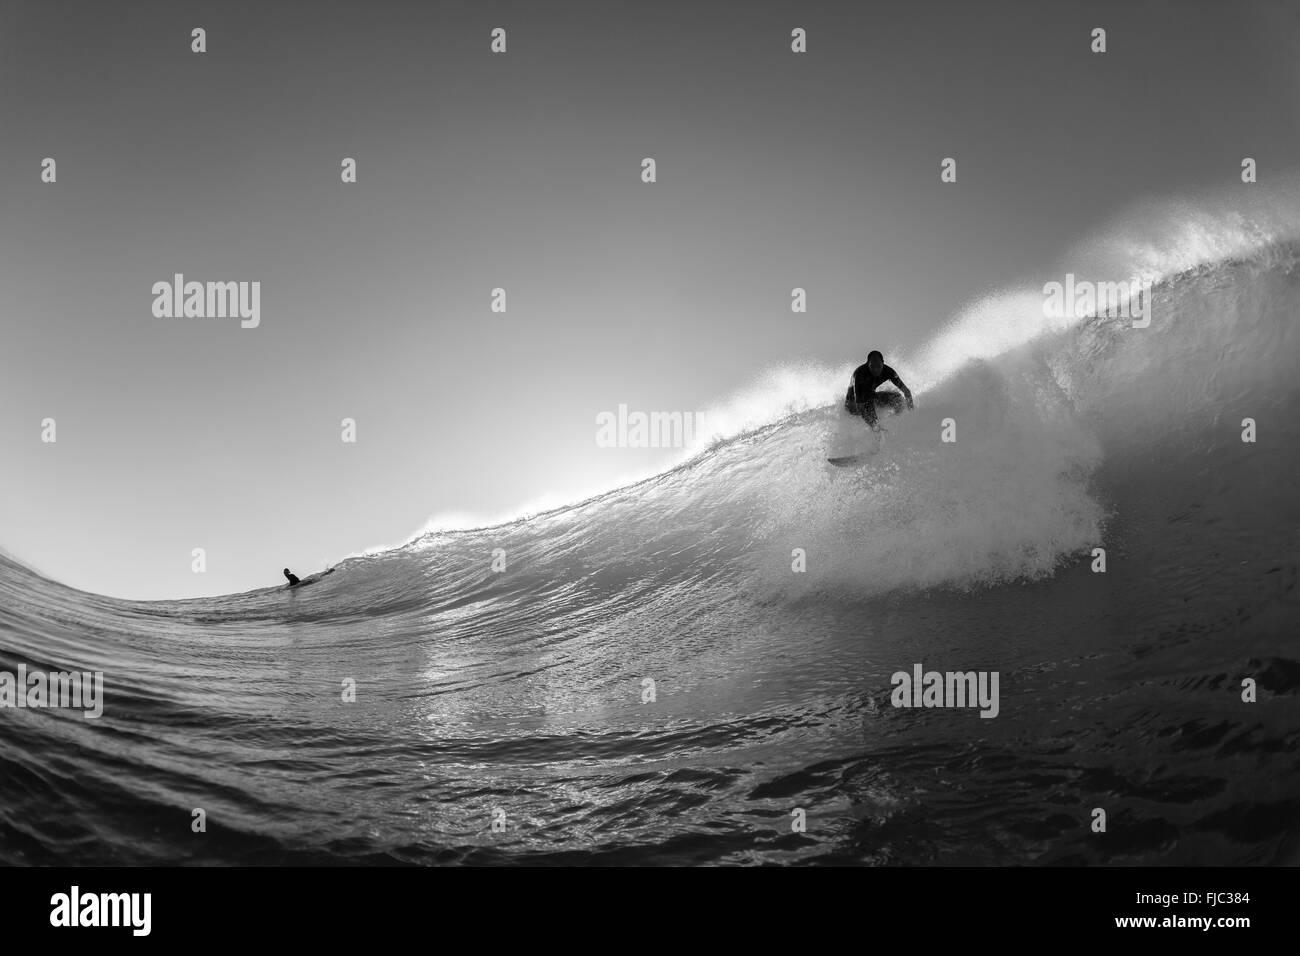 Surfing surfer take off catching crashing ocean wave vintage black and white - Stock Image